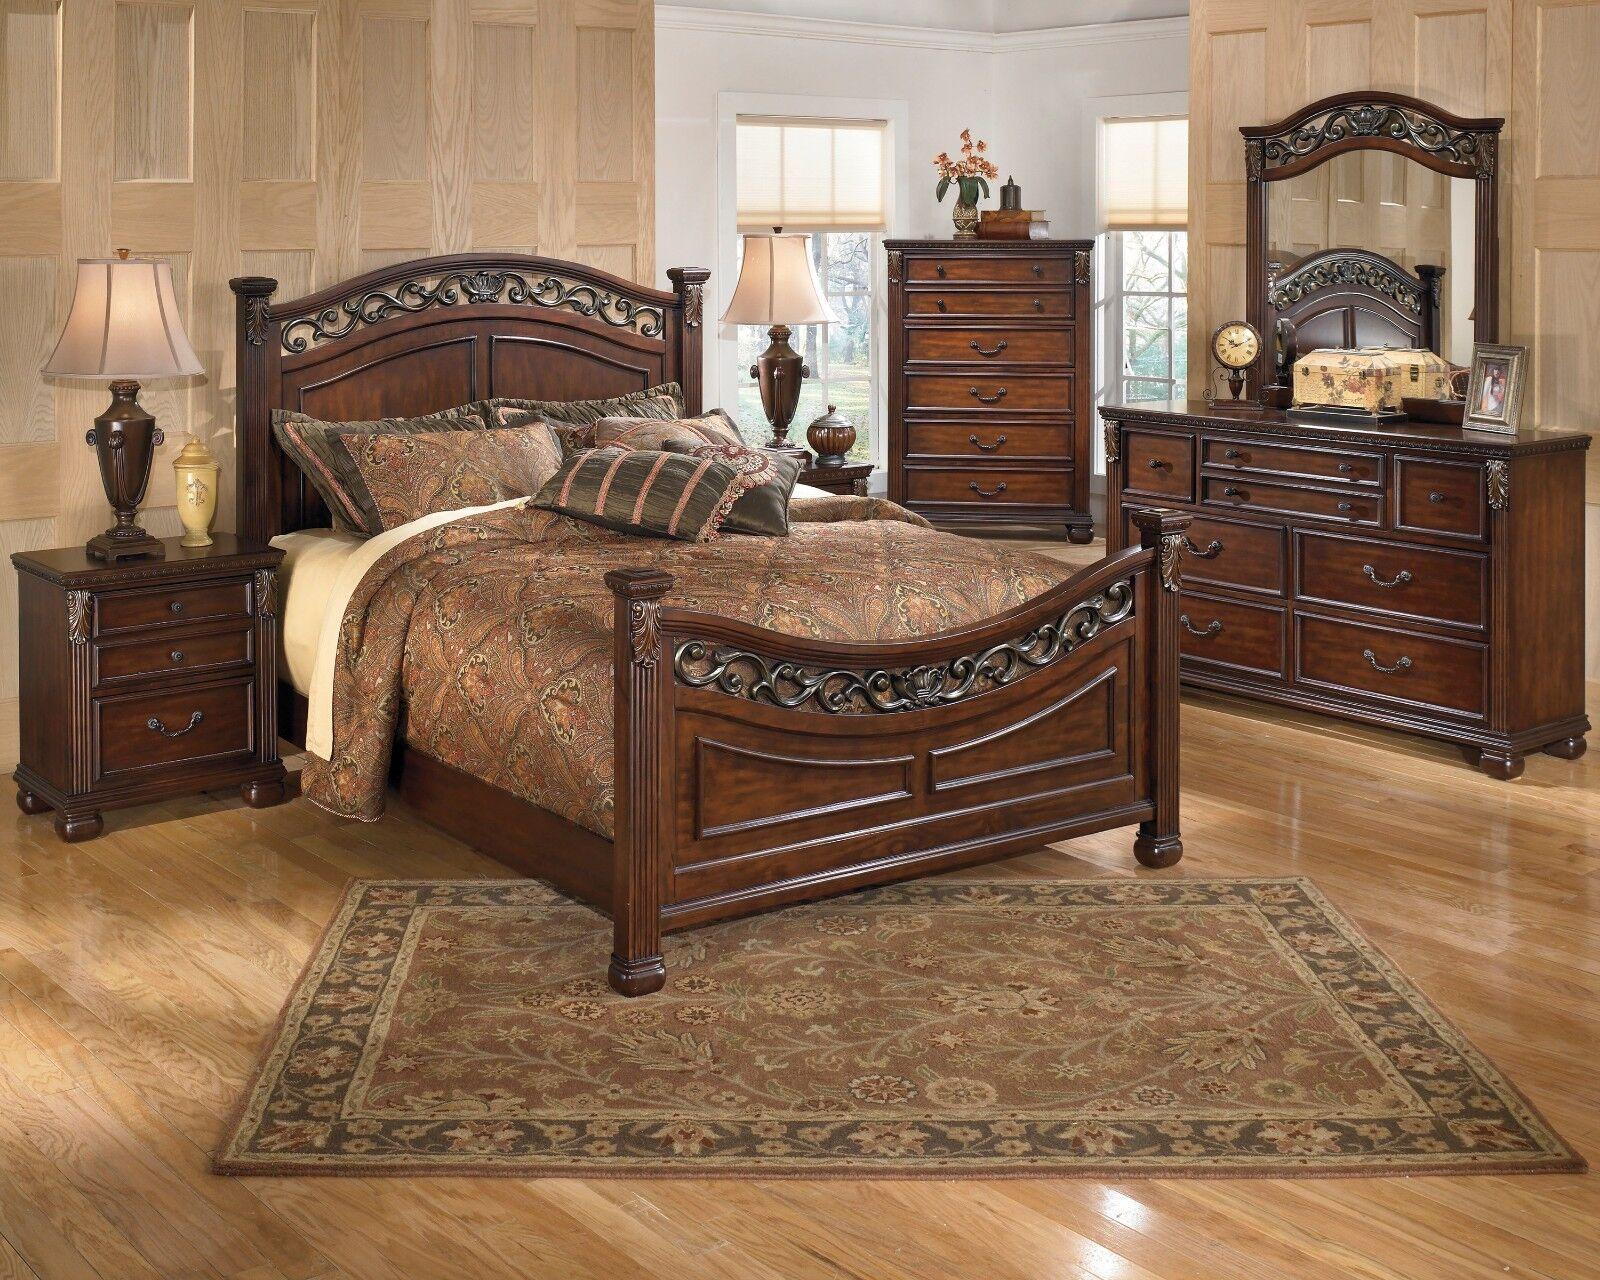 Ashley Furniture Leahlyn Queen Panel 6 Piece Bedroom Set For Sale Online